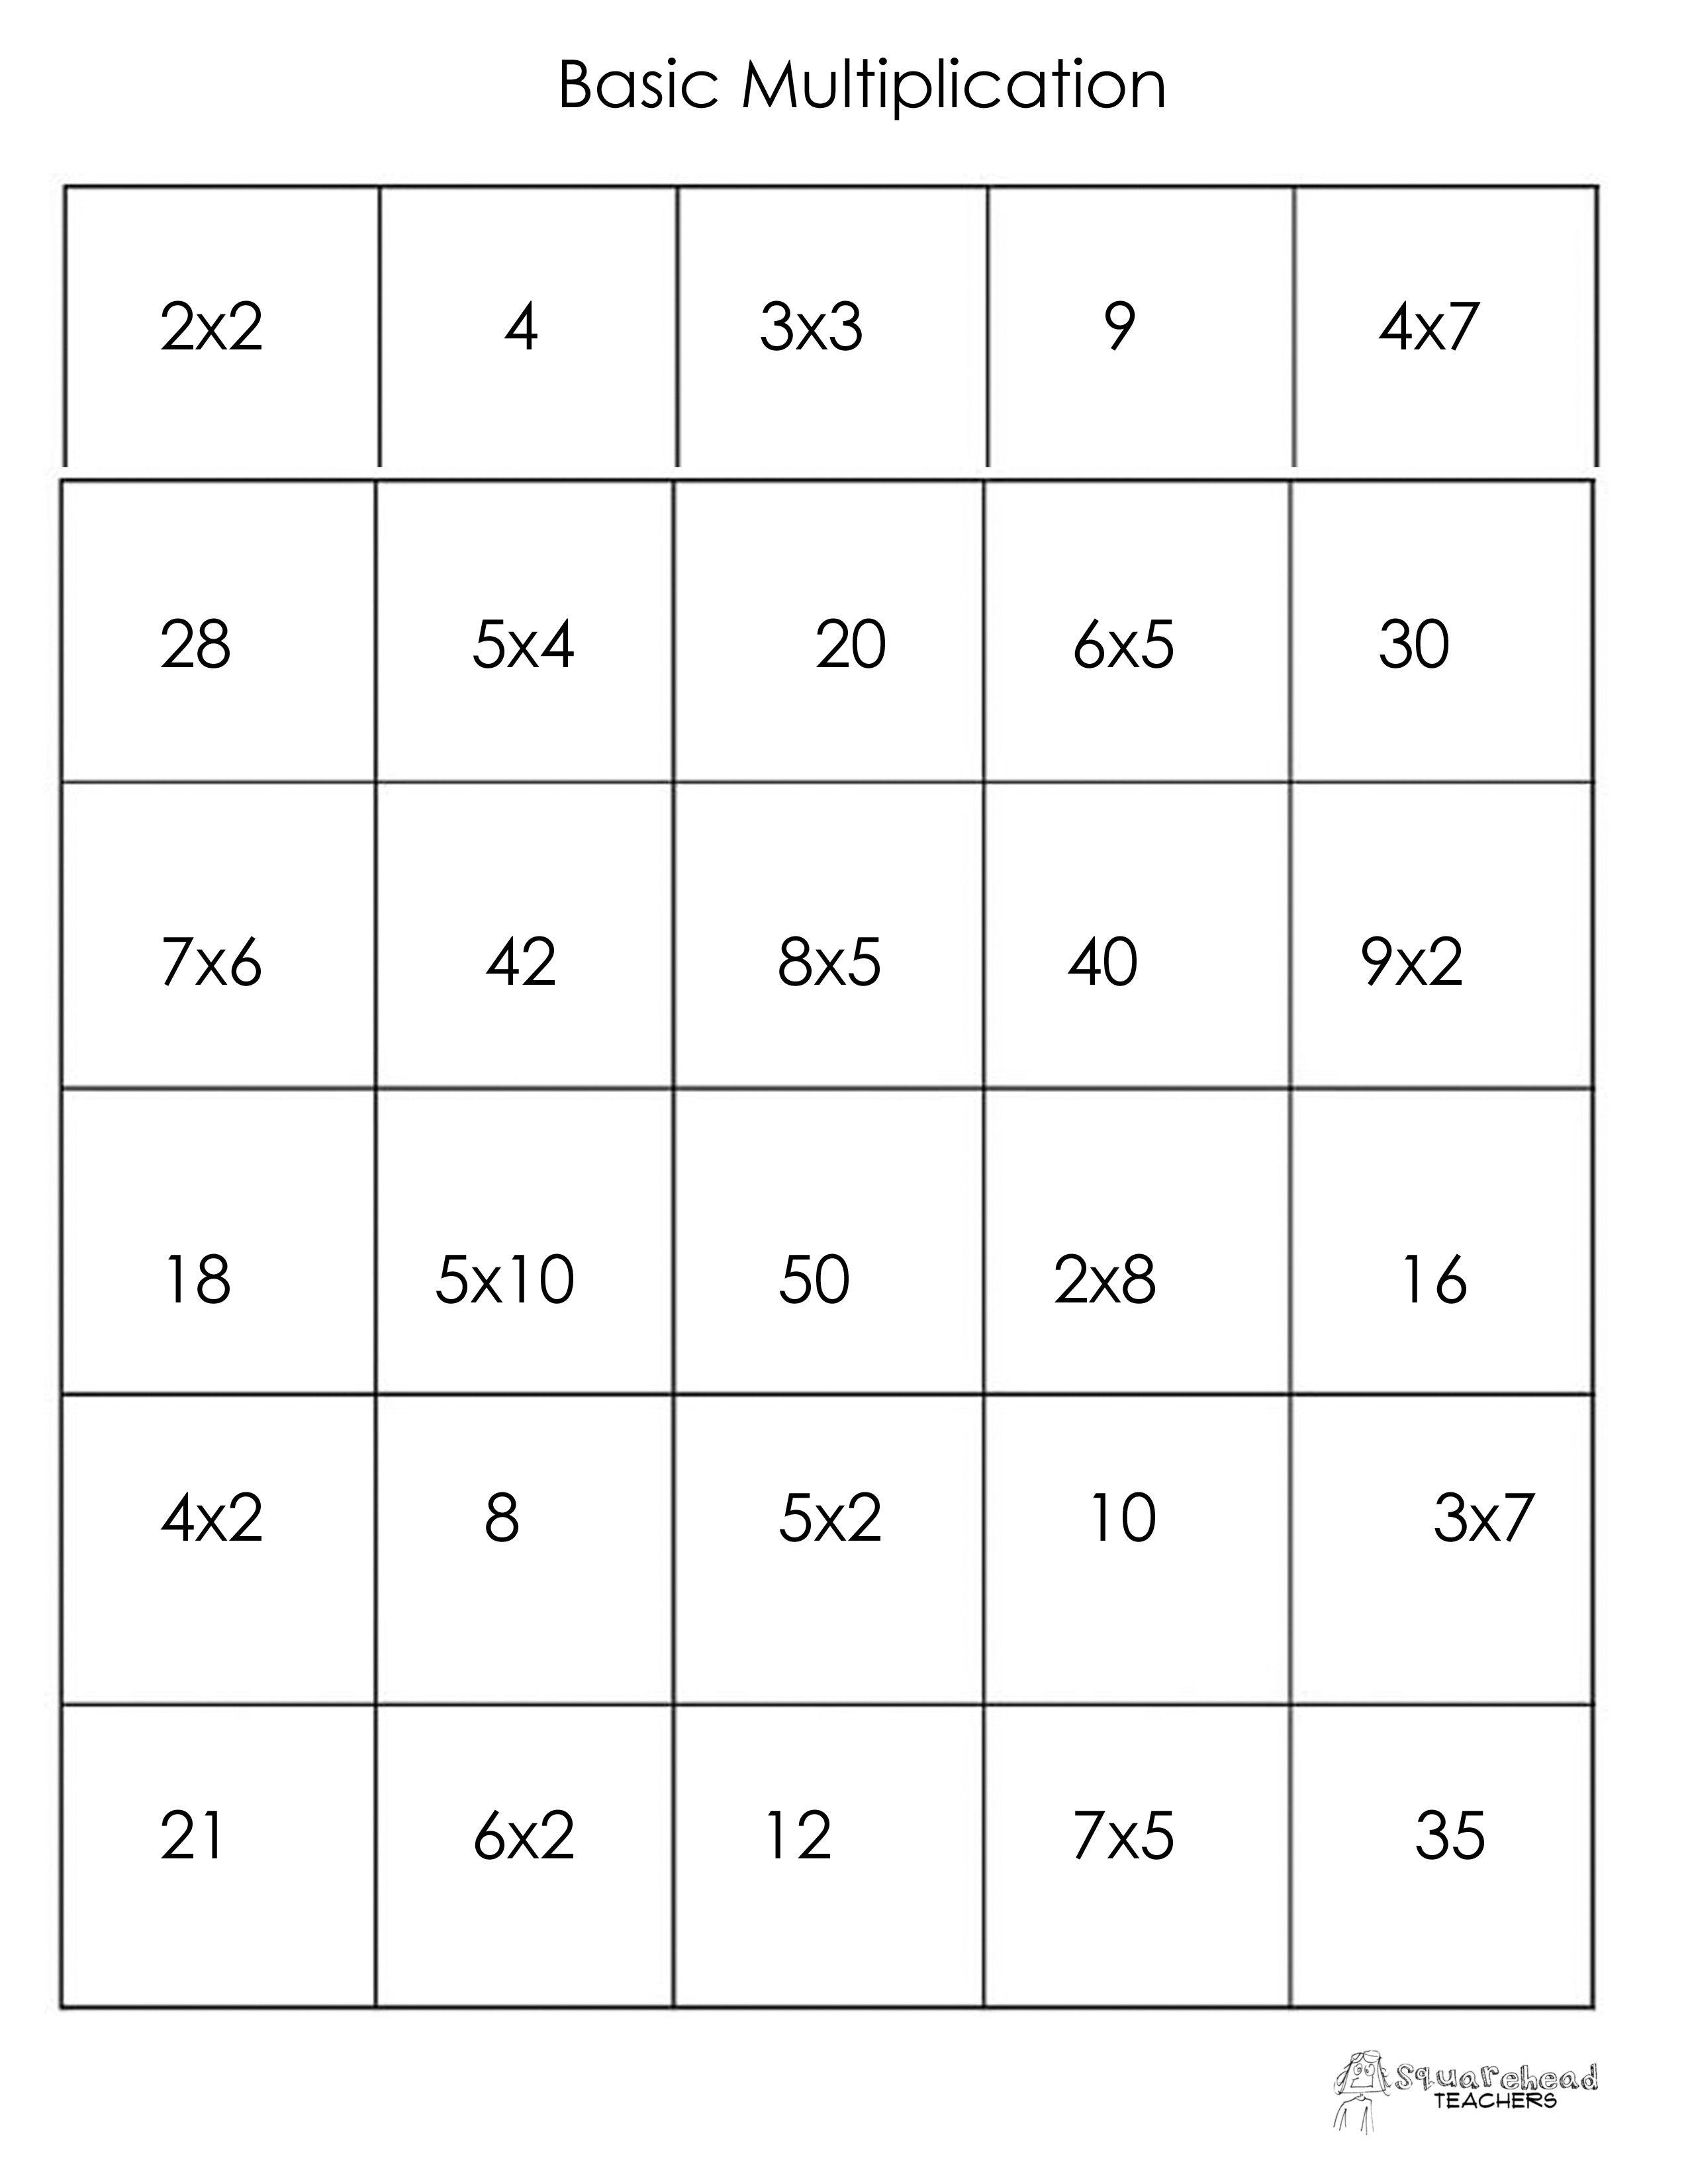 Multiplication Worksheets Printable Thanksgiving Games Thanksgiving Math Multiplication Printable Math Games [ 3300 x 2550 Pixel ]